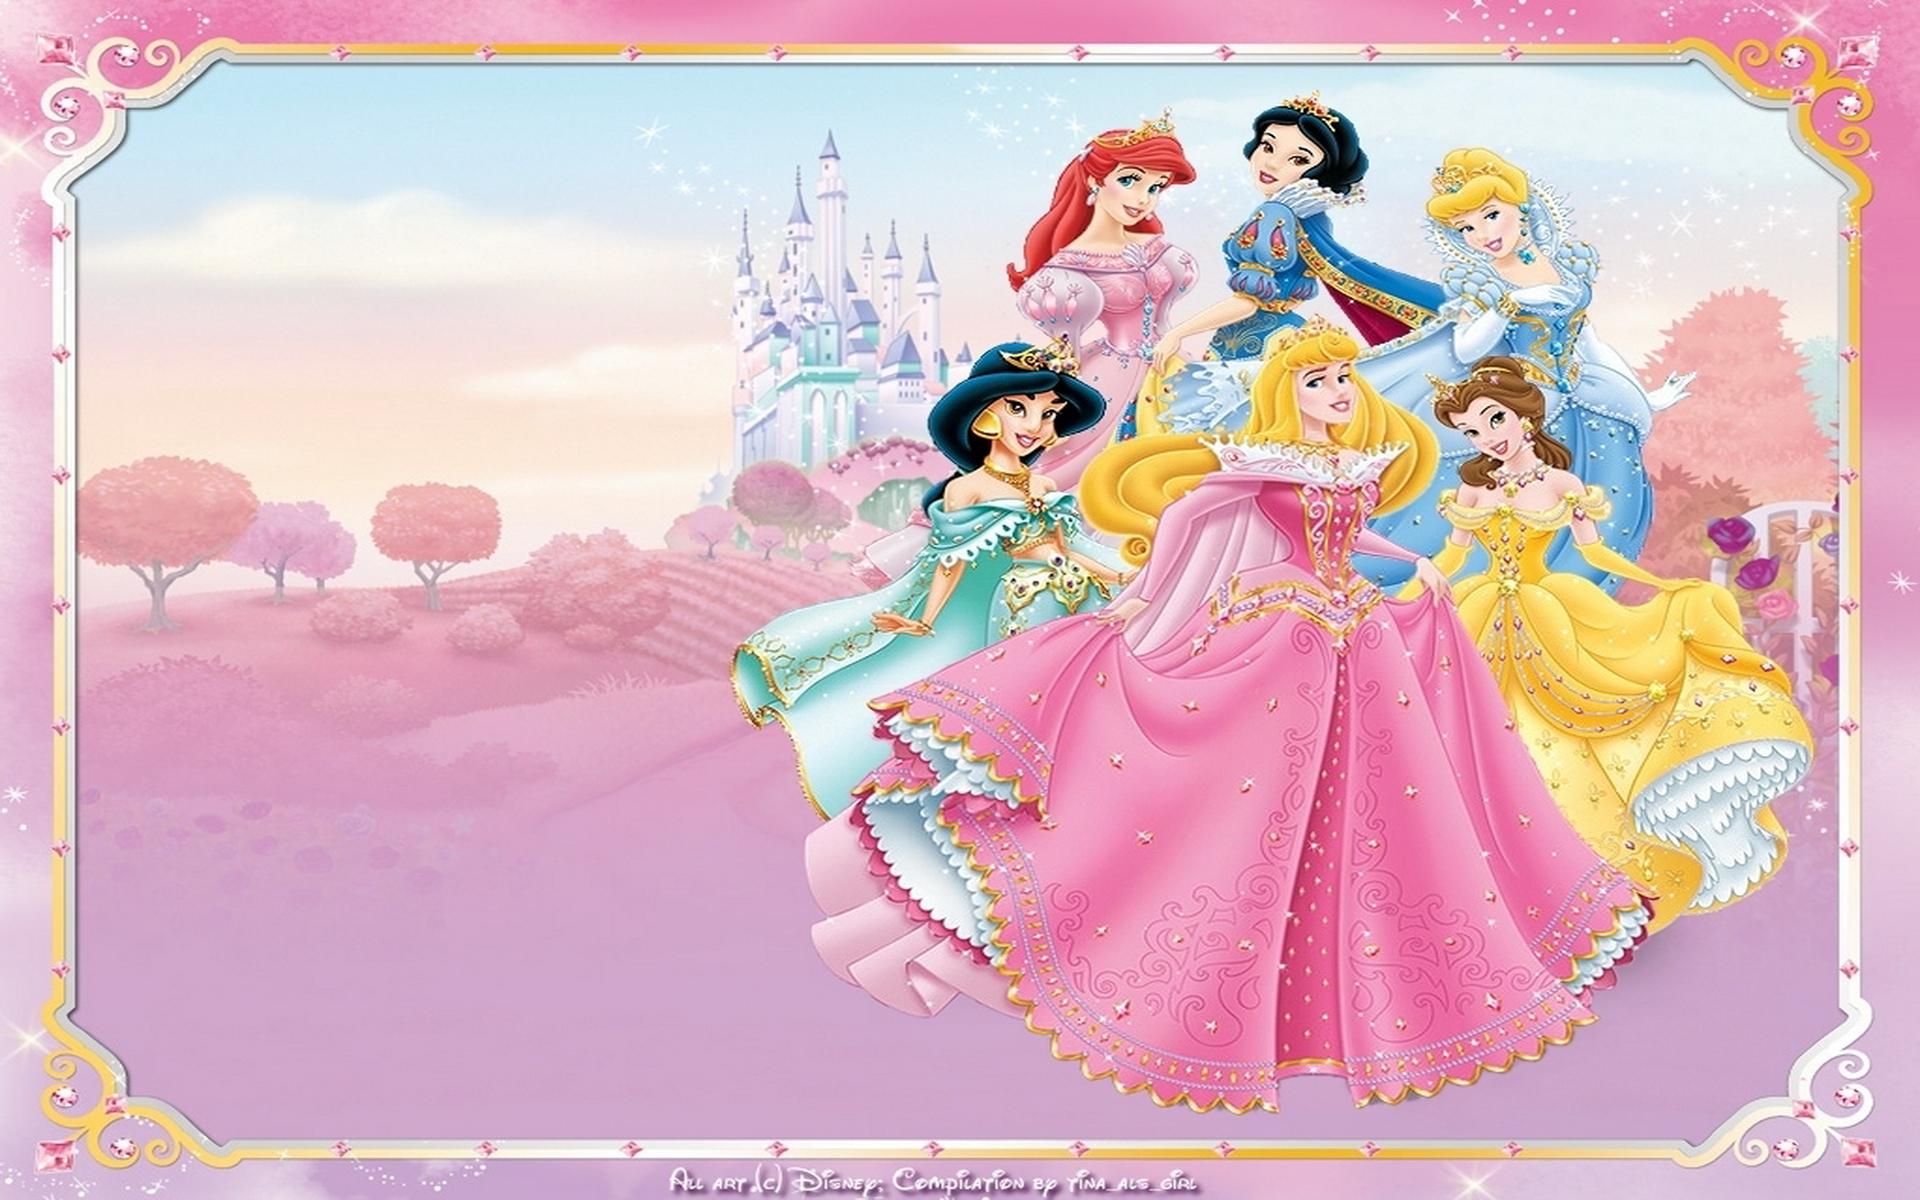 princess 6170514 1024 768jpg Wallpaper Disney Princess Wallpaper 1920x1200